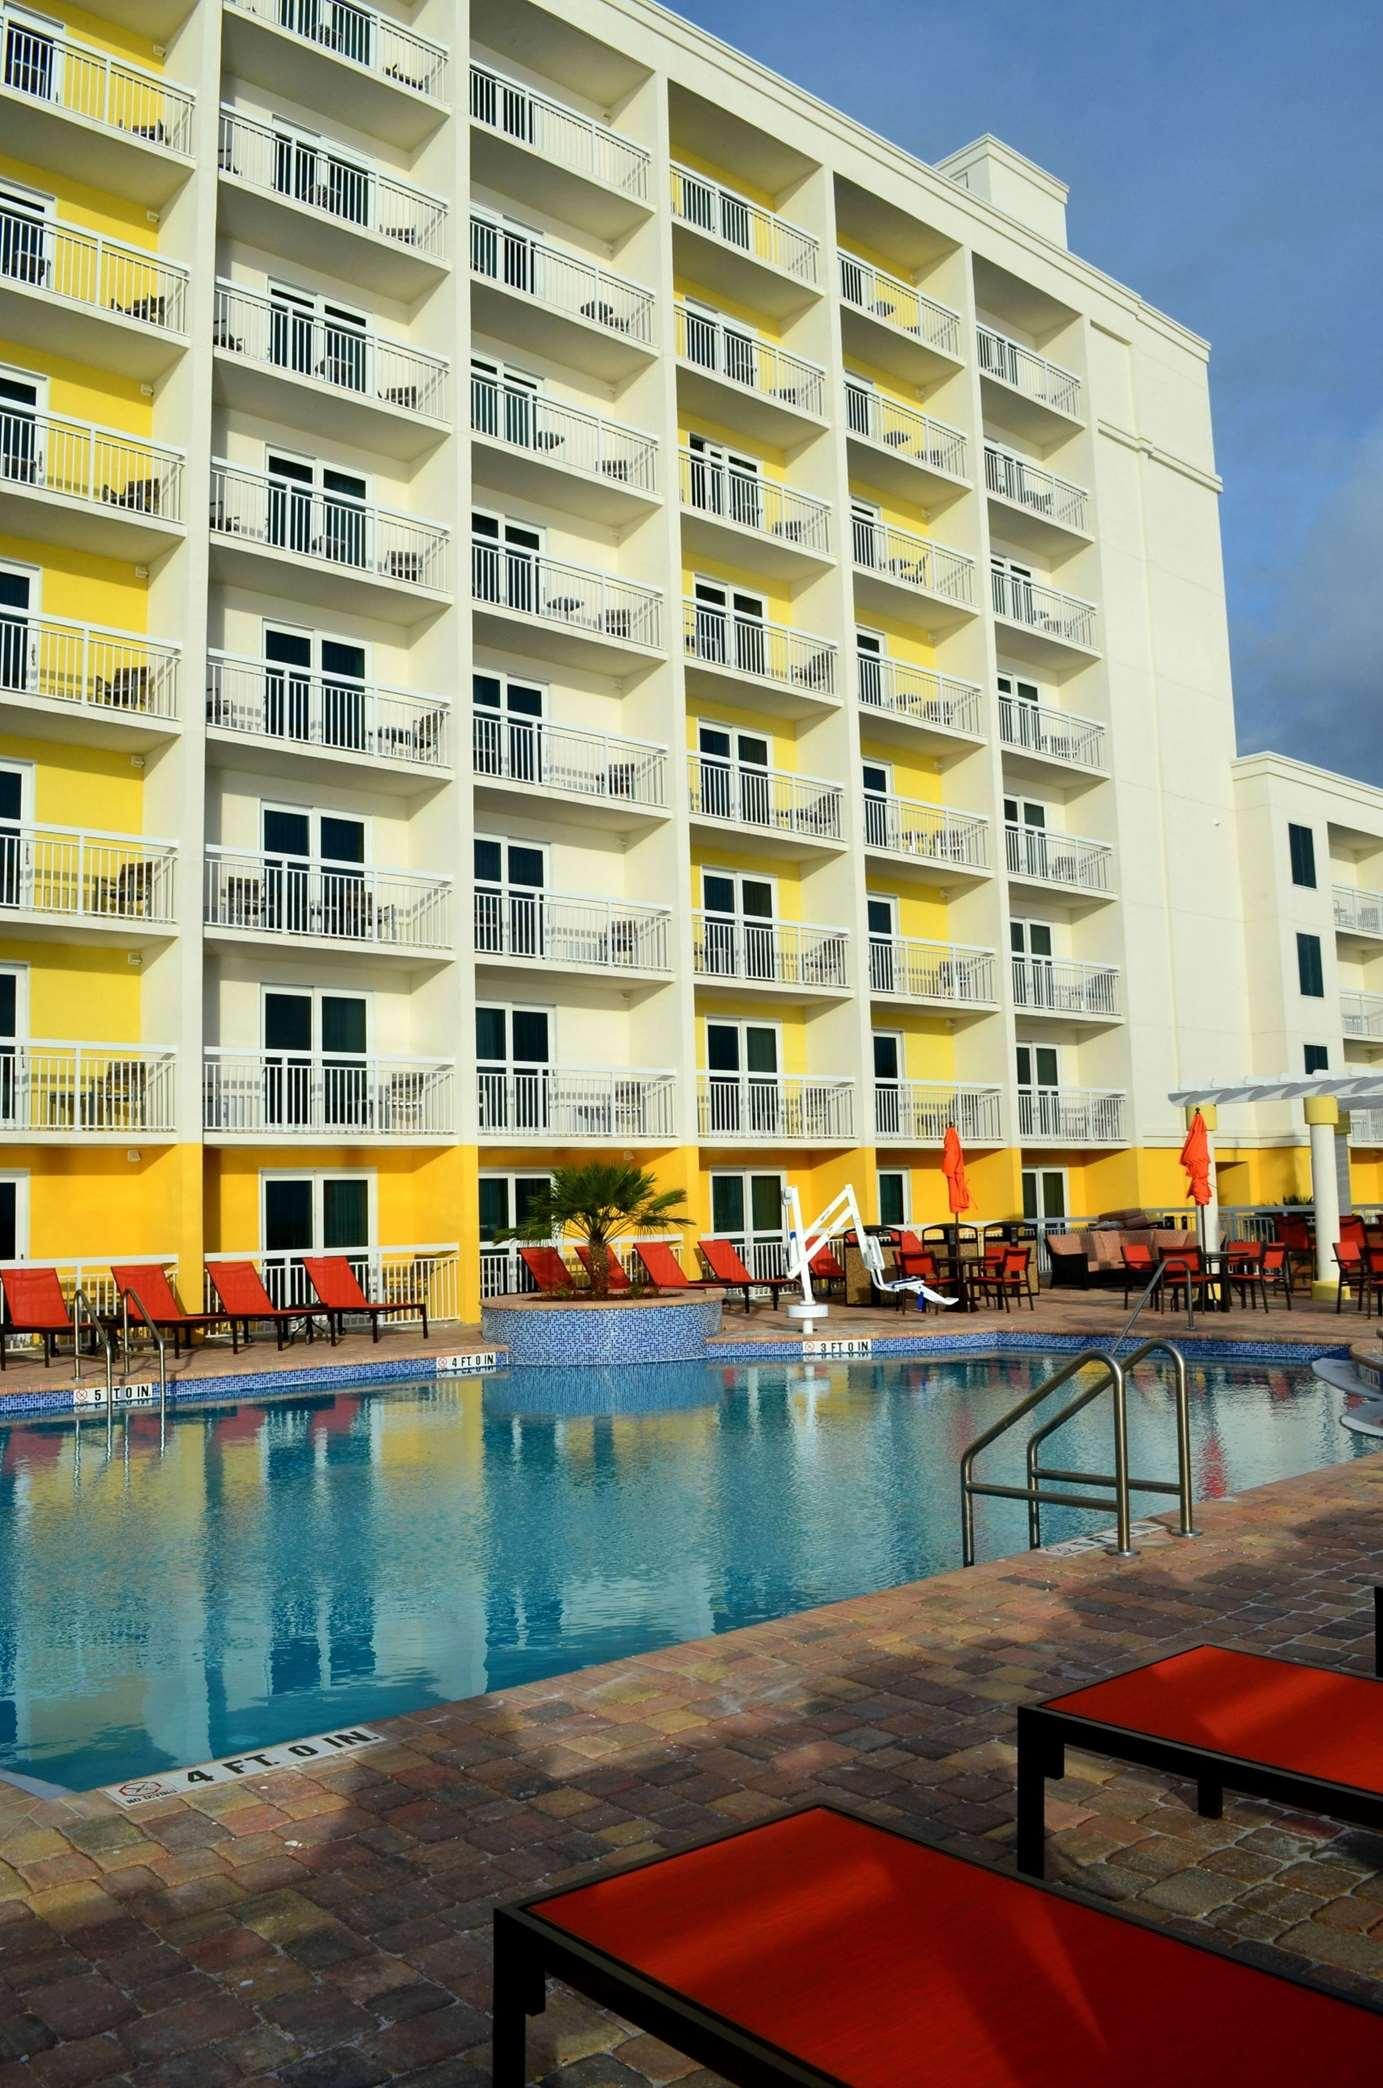 Hilton Garden Inn Daytona Beach Oceanfront Daytona Beach Florida